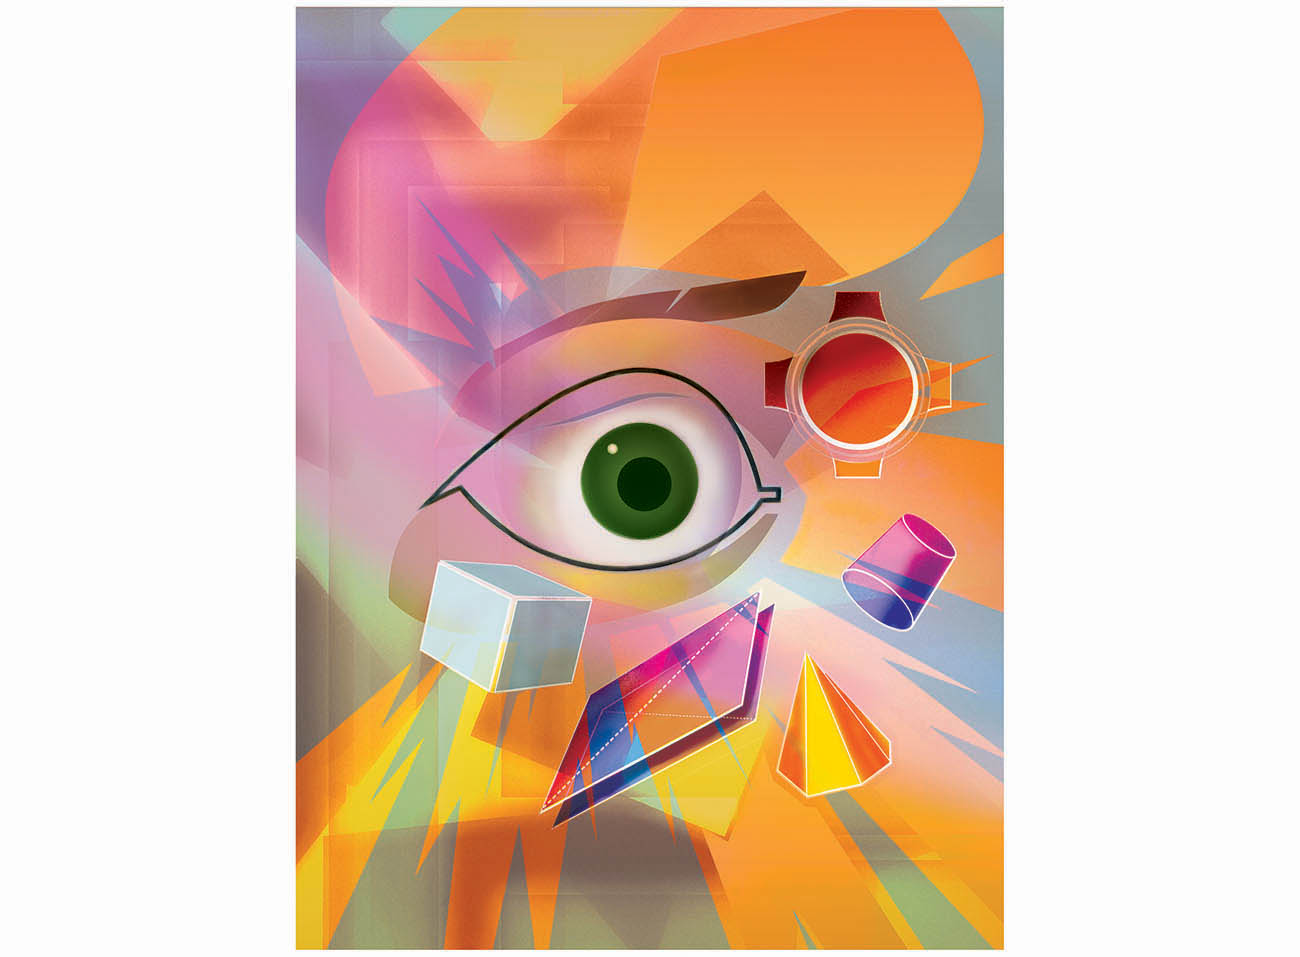 EyePopping_Web_1a